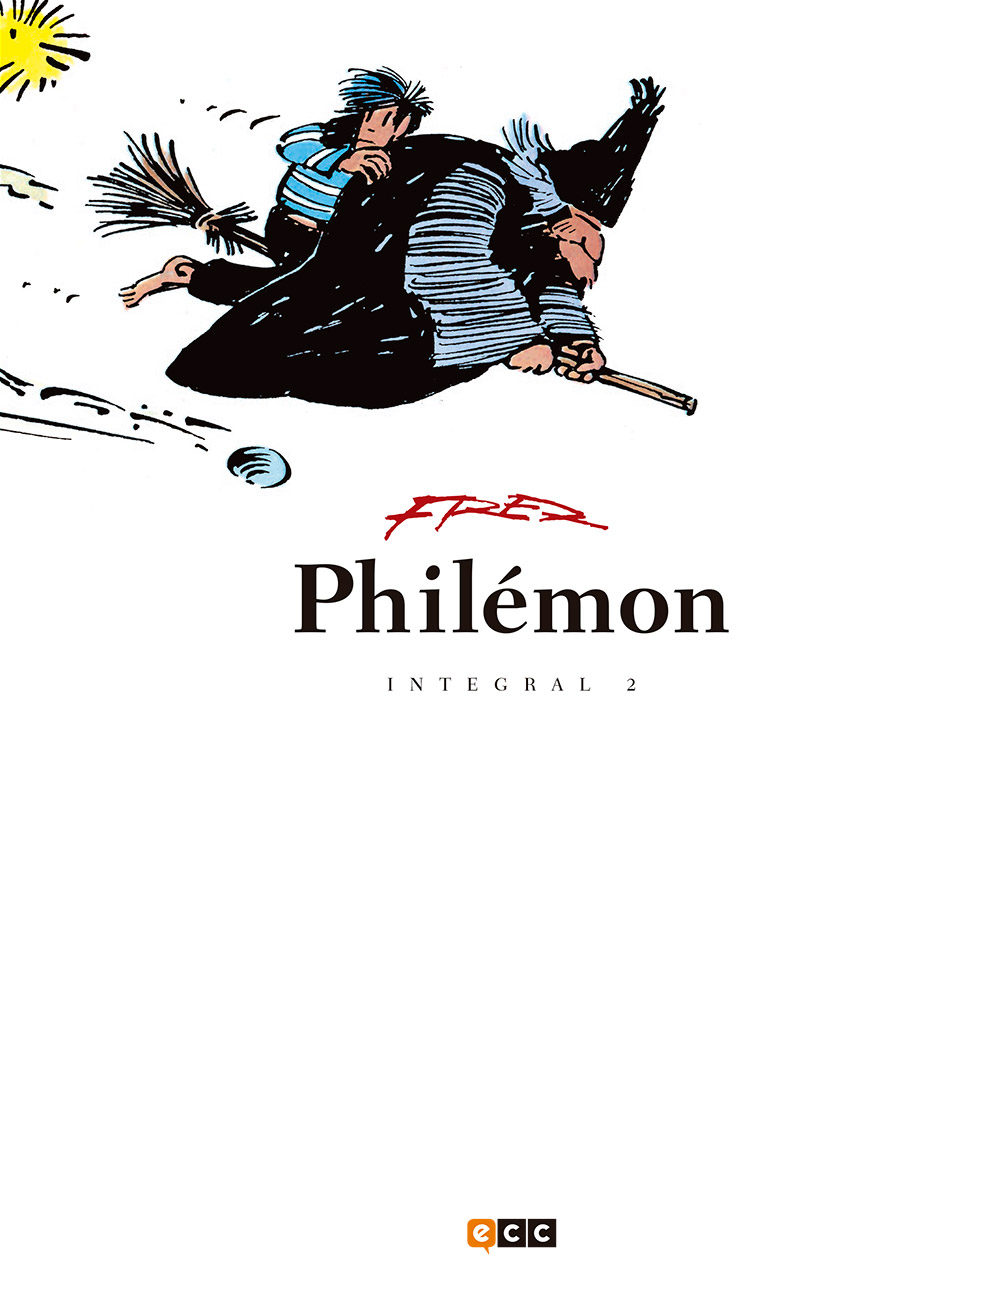 Philemon 2 por Fred epub